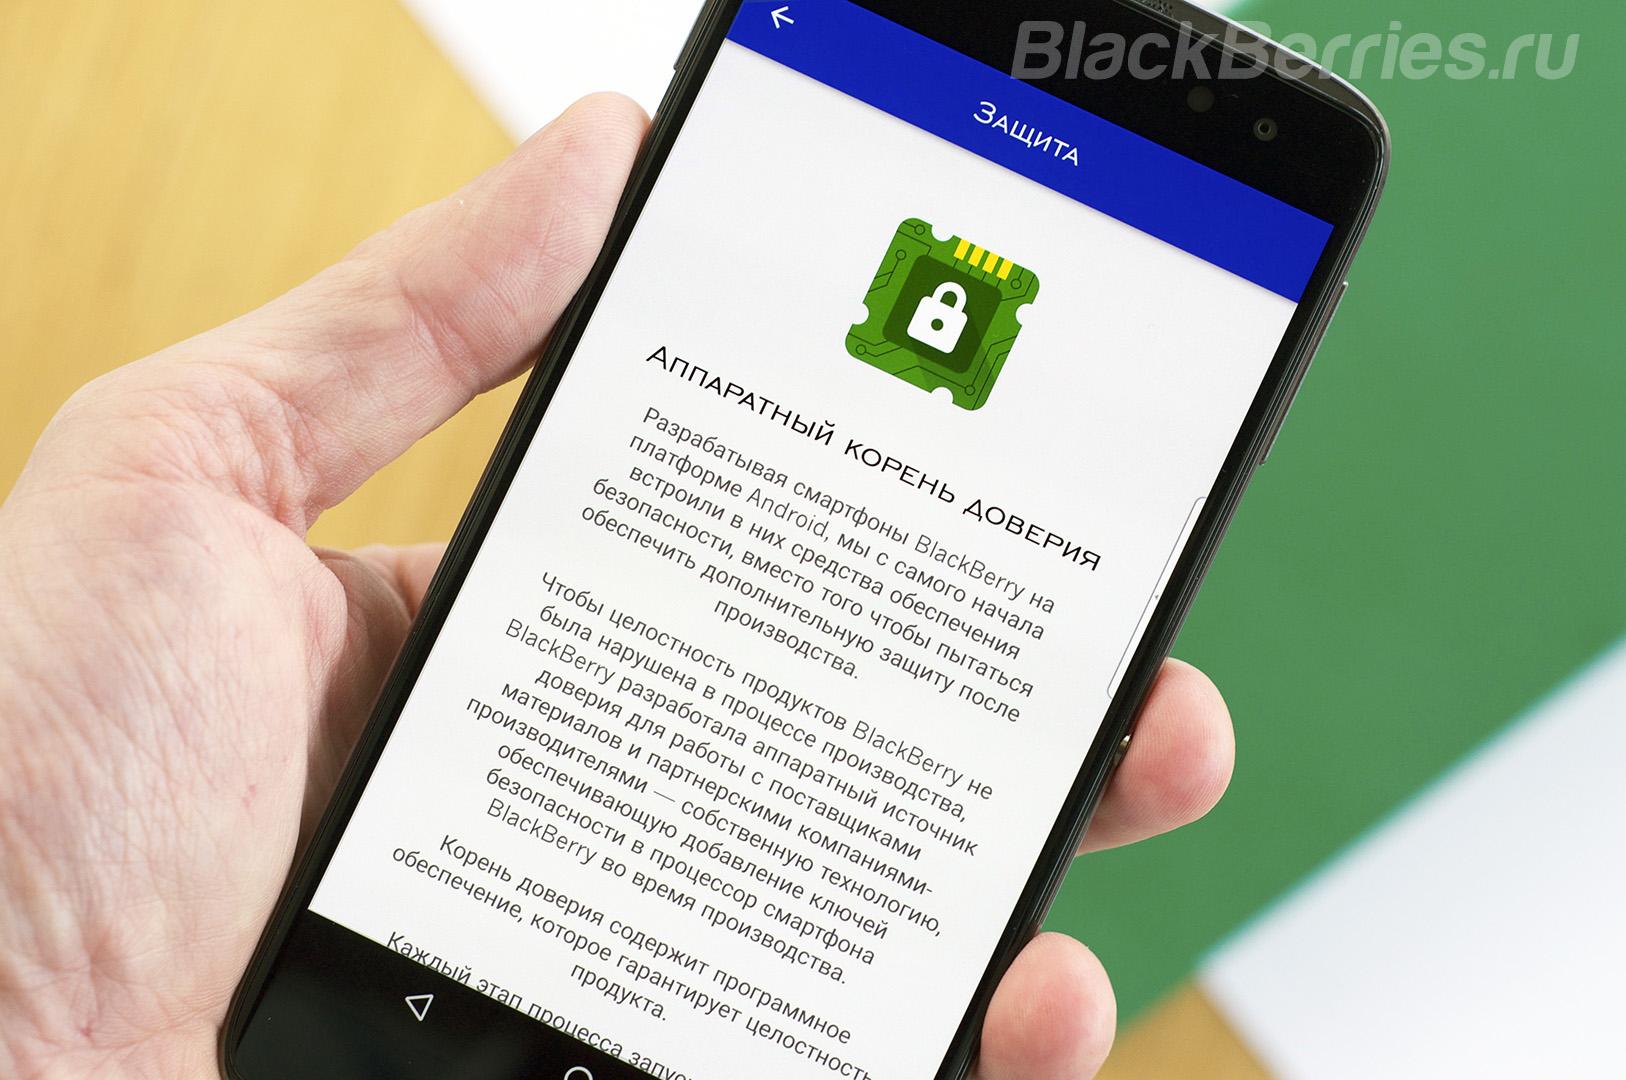 blackberry-dtek60-review-2-19